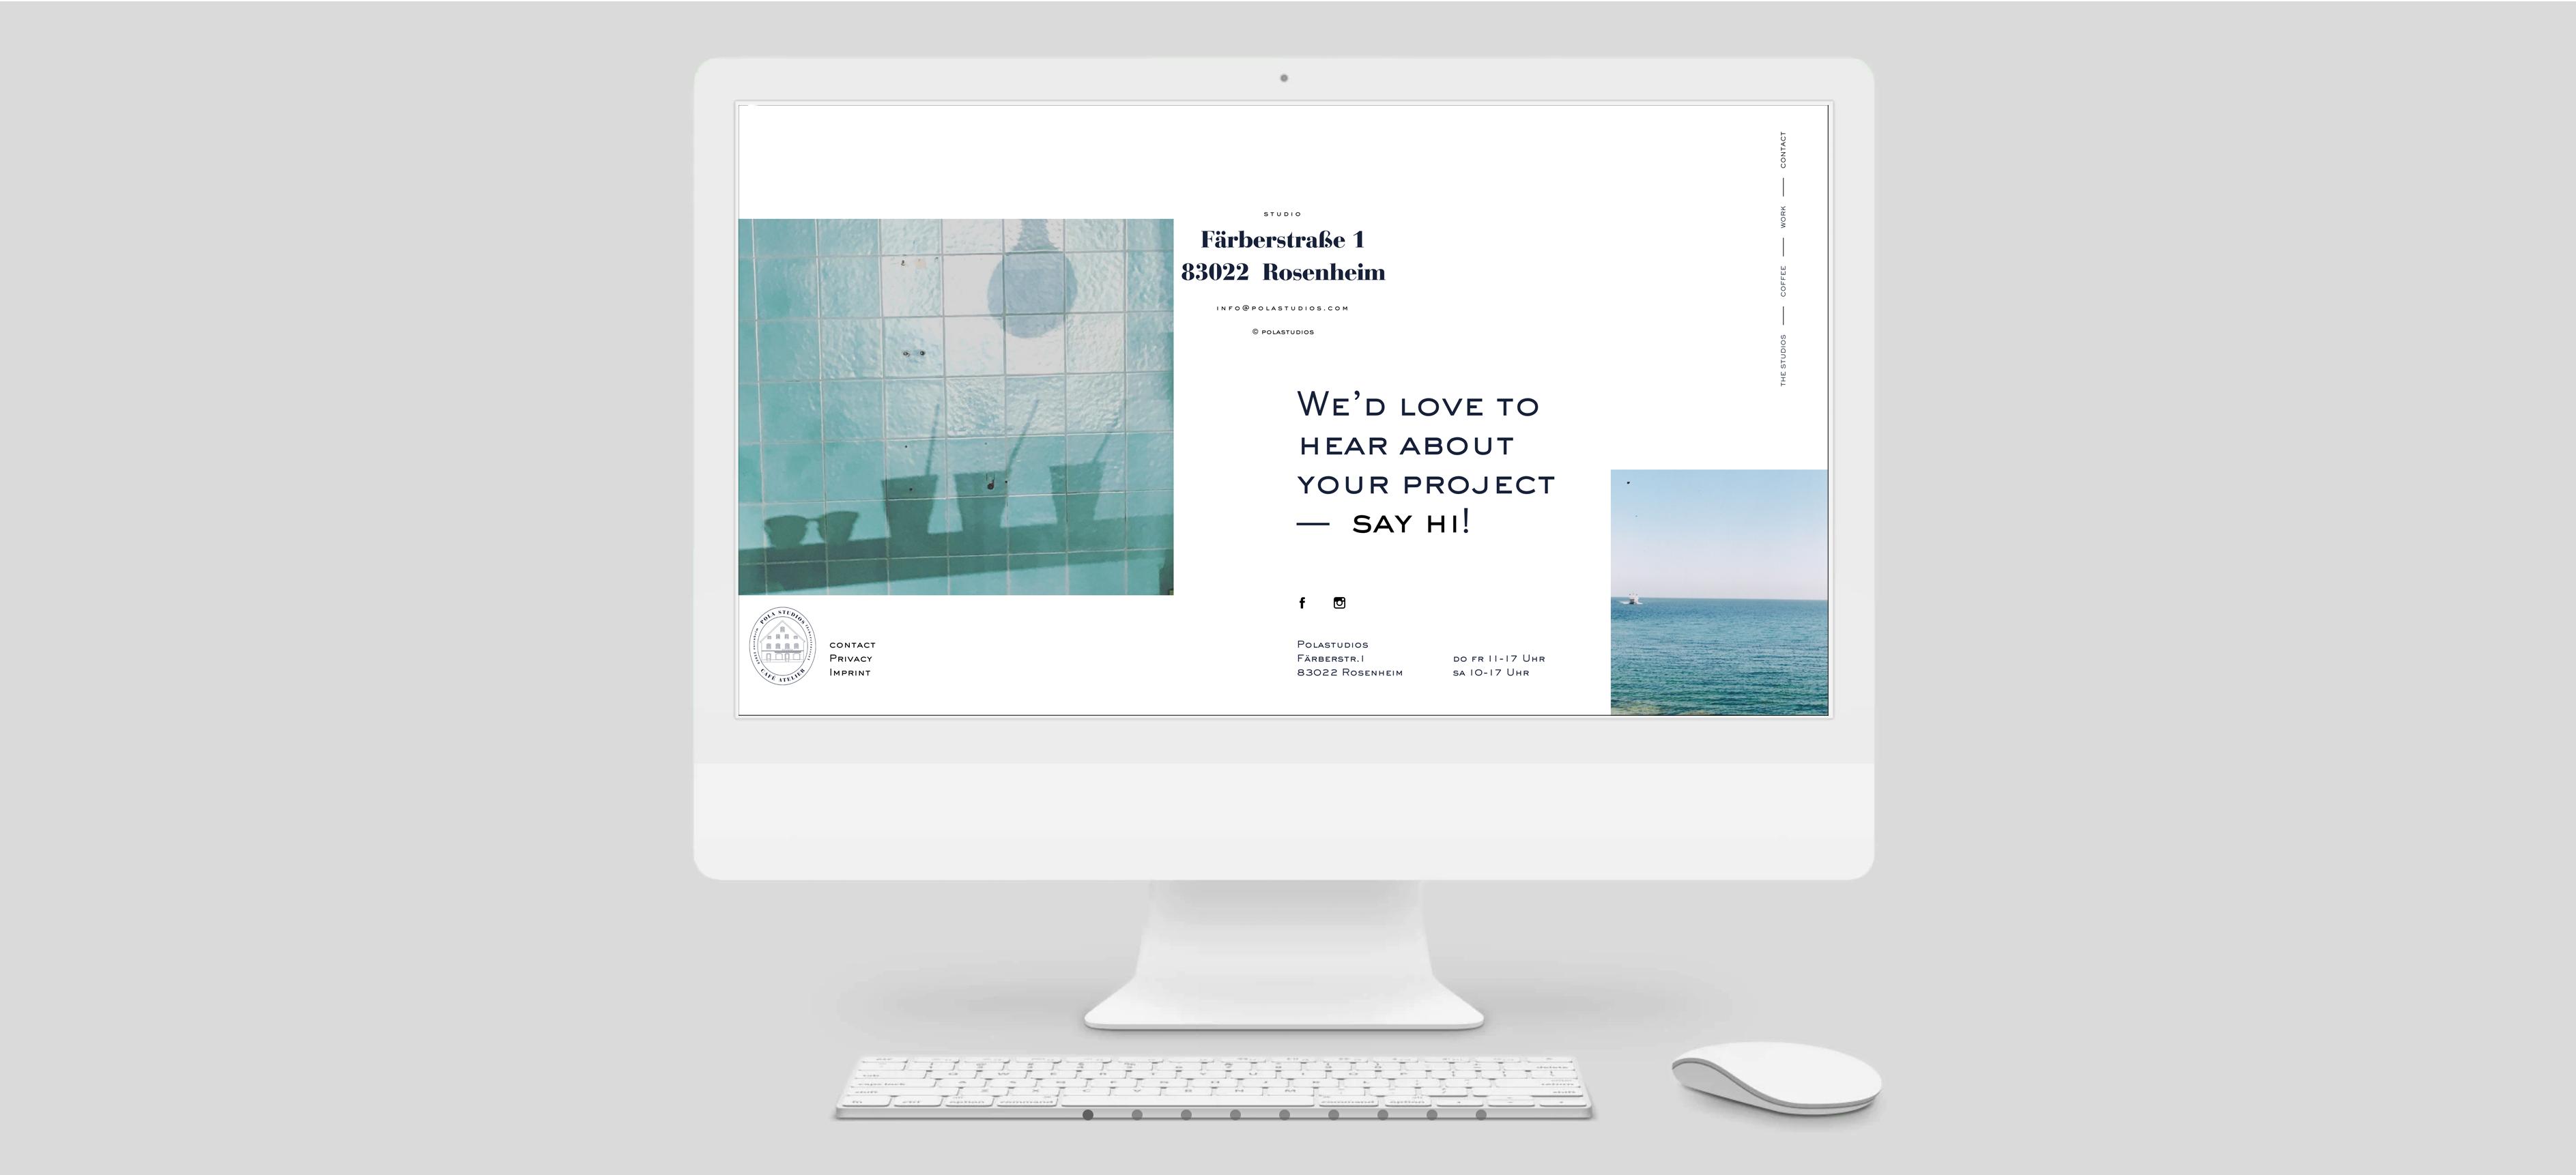 Webdesign und Responsive Design für Polastudios in Rosenheim